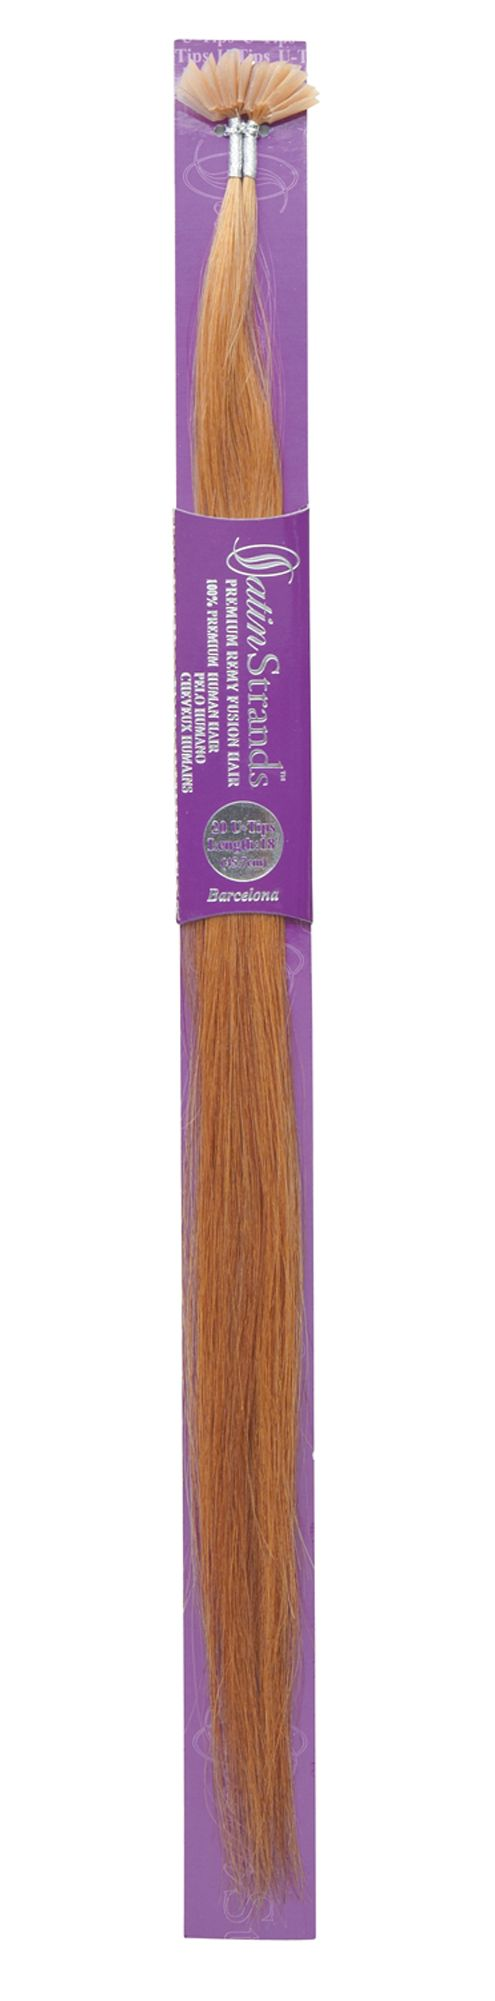 Satin Strands I Tip Hair Extensions Reviews 40